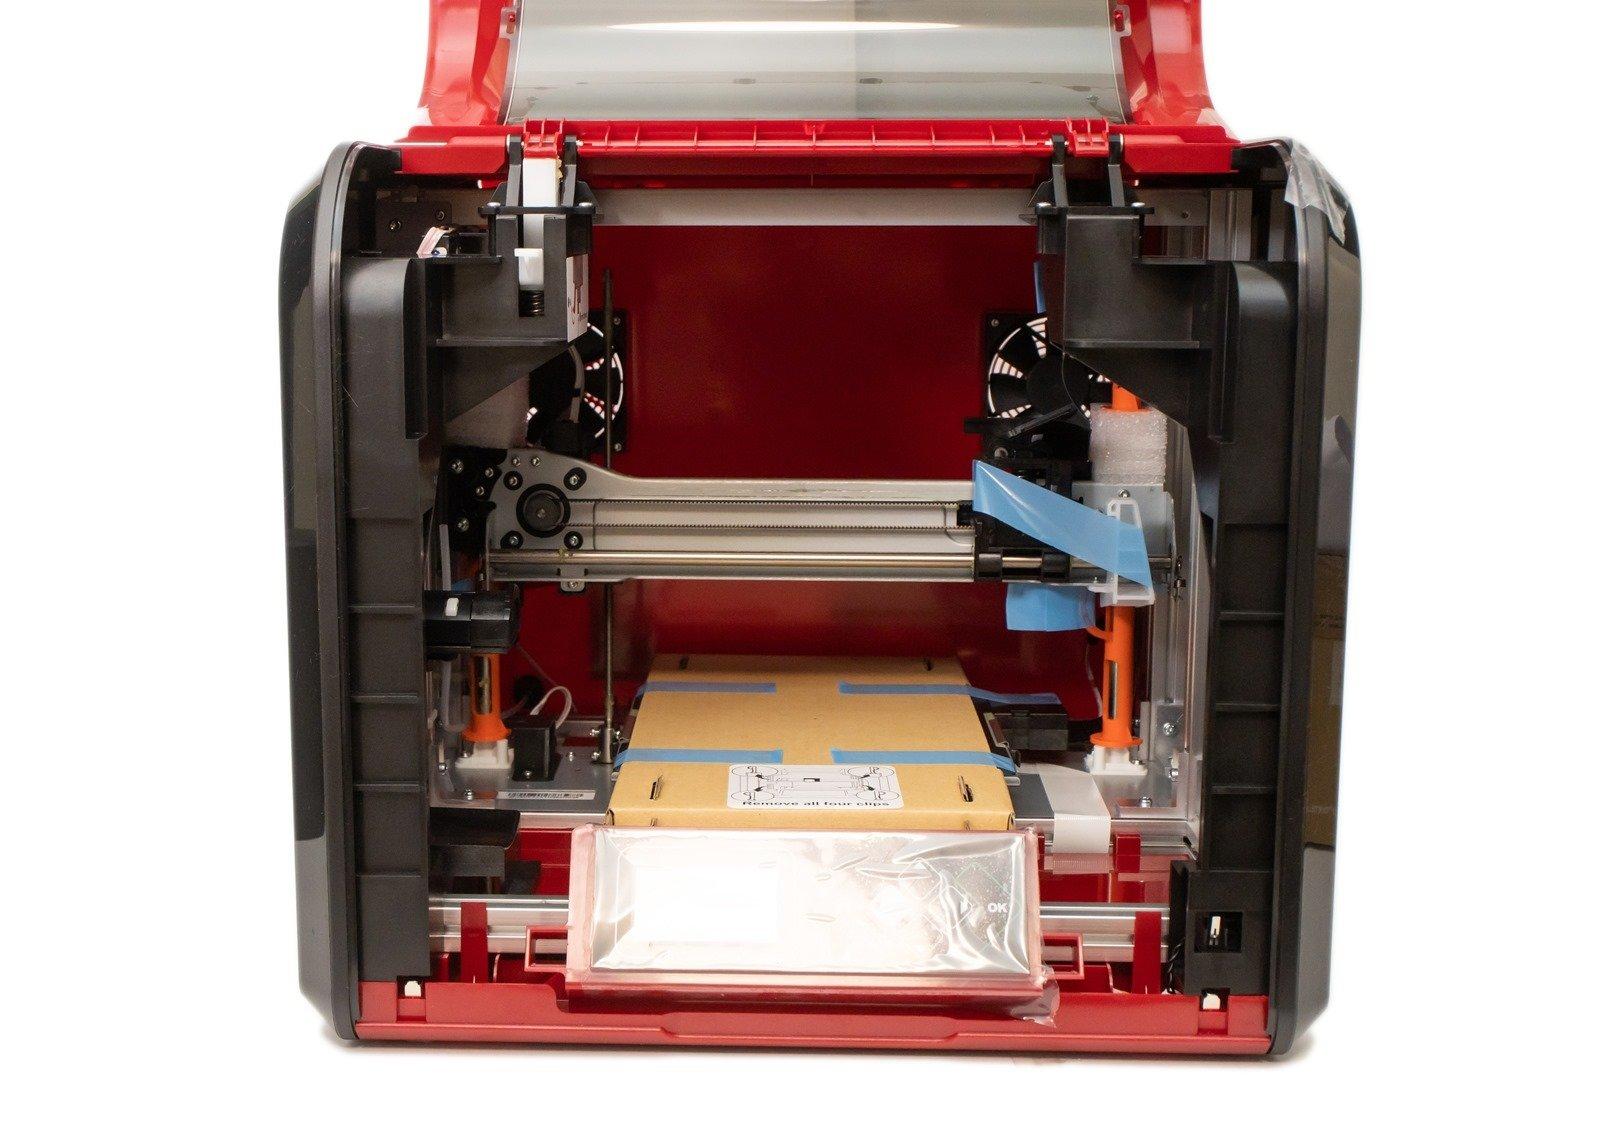 多功能3D列印機-da Vinci Jr. Pro X+,3D列印機內部構造